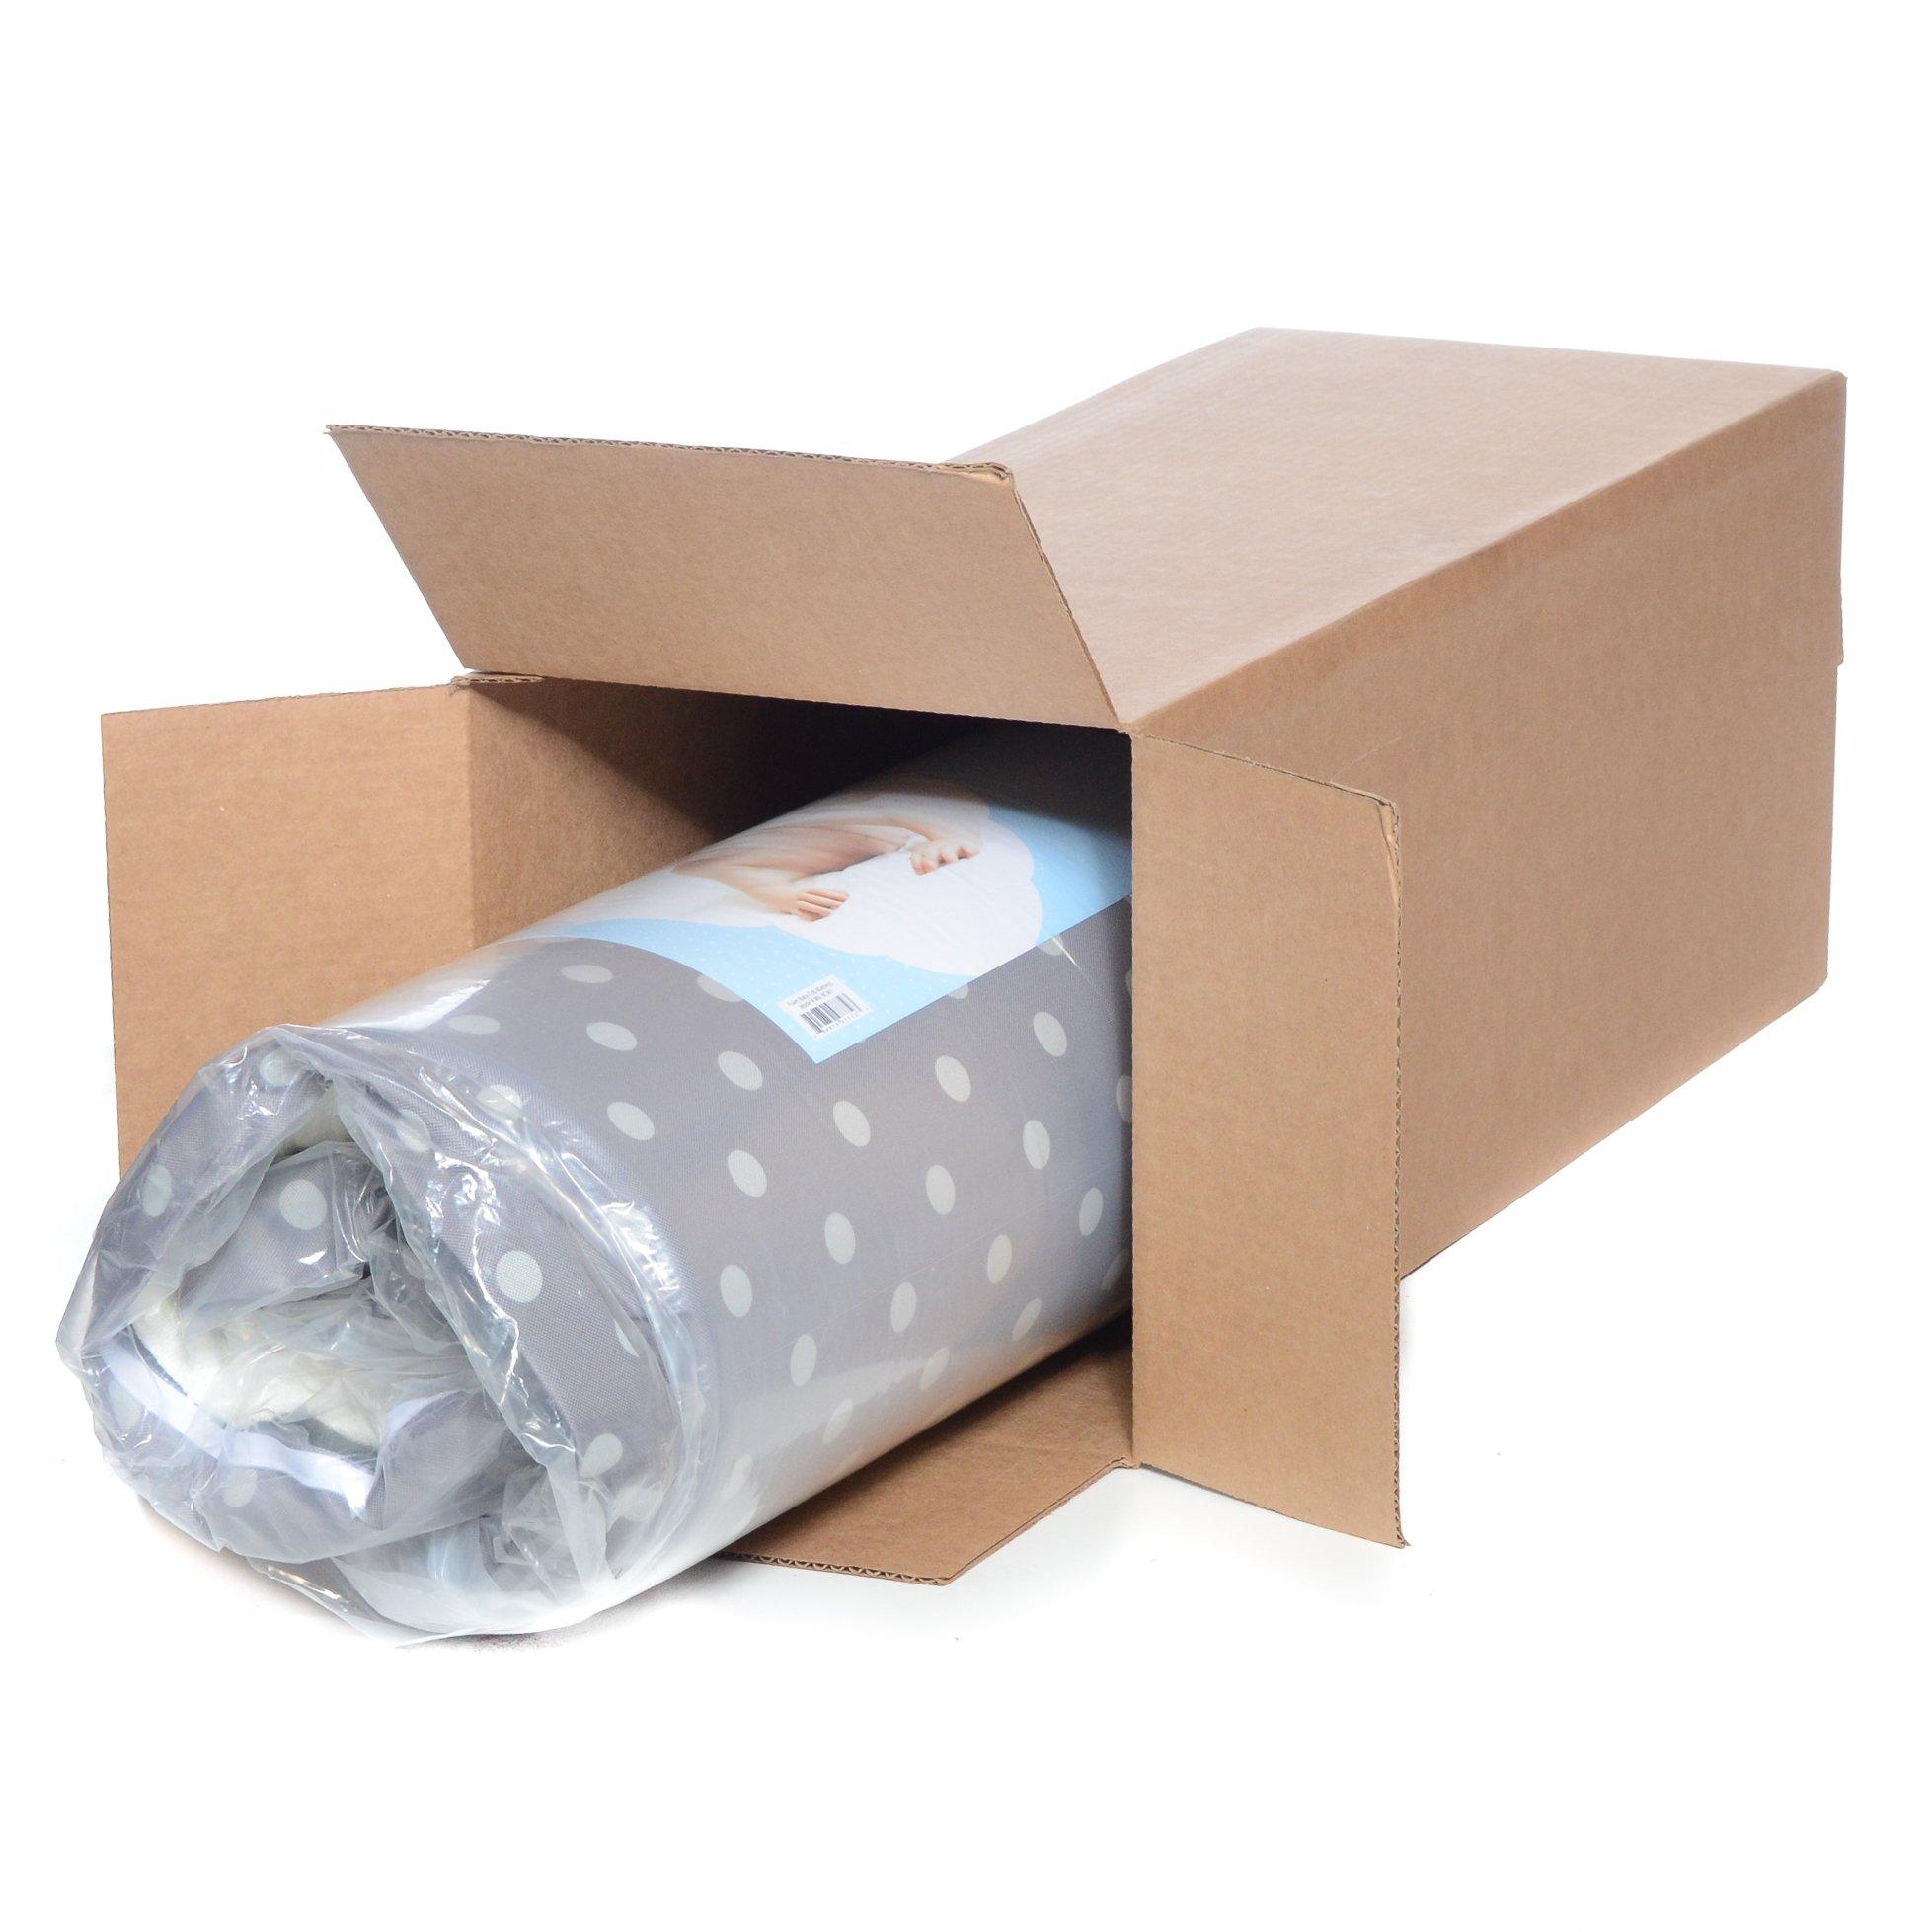 Milliard Crib Mattress and Toddler Bed Mattress | Hypoallergenic + Waterproof Encasement | 27.5''x52''x5'' by Milliard (Image #2)